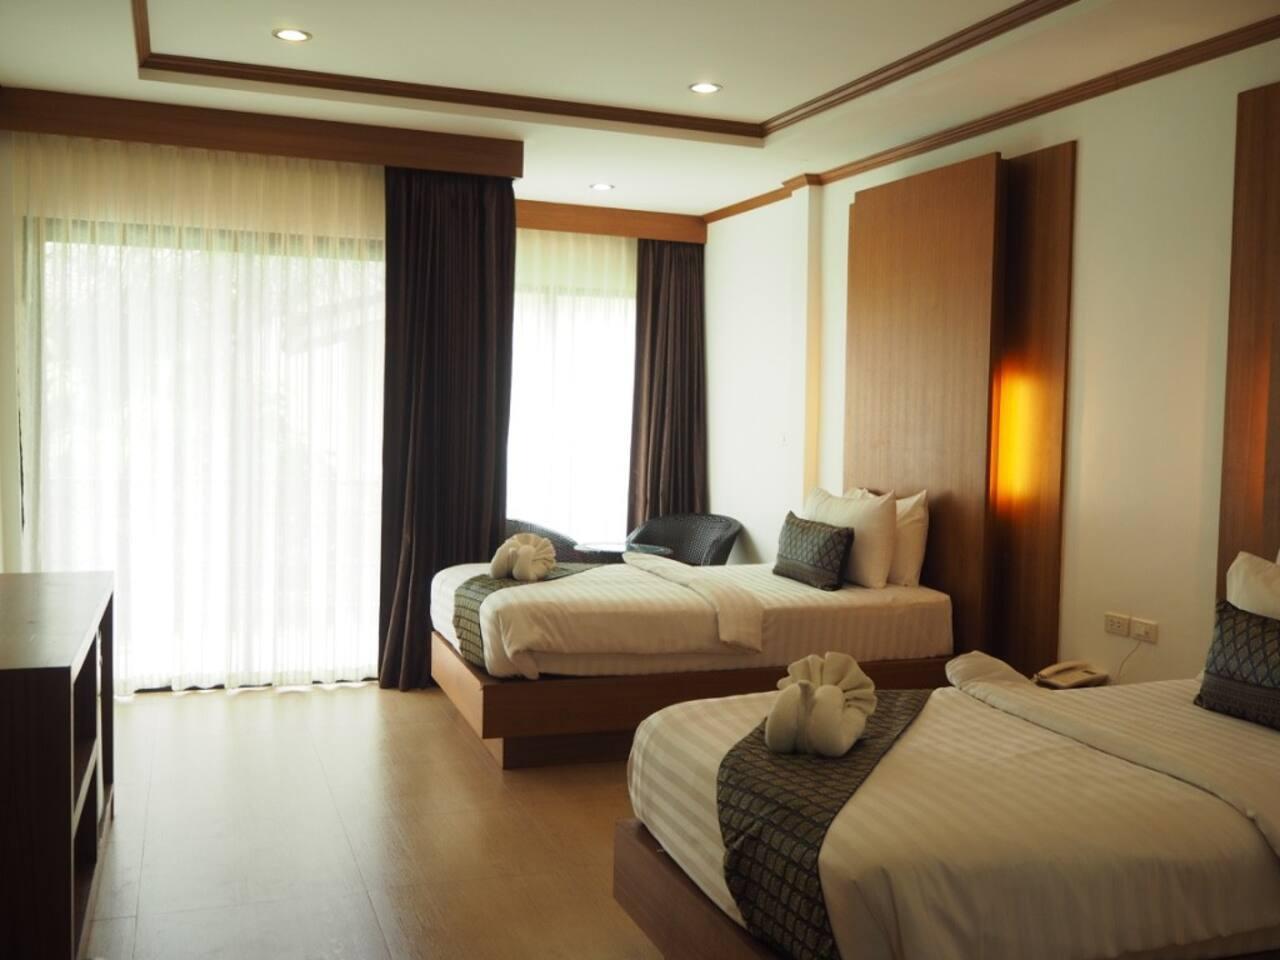 Secluded Modern room Double or Twin beds สตูดิโอ วิลลา 1 ห้องน้ำส่วนตัว ขนาด 45 ตร.ม. – อ่าวโละดาลัม